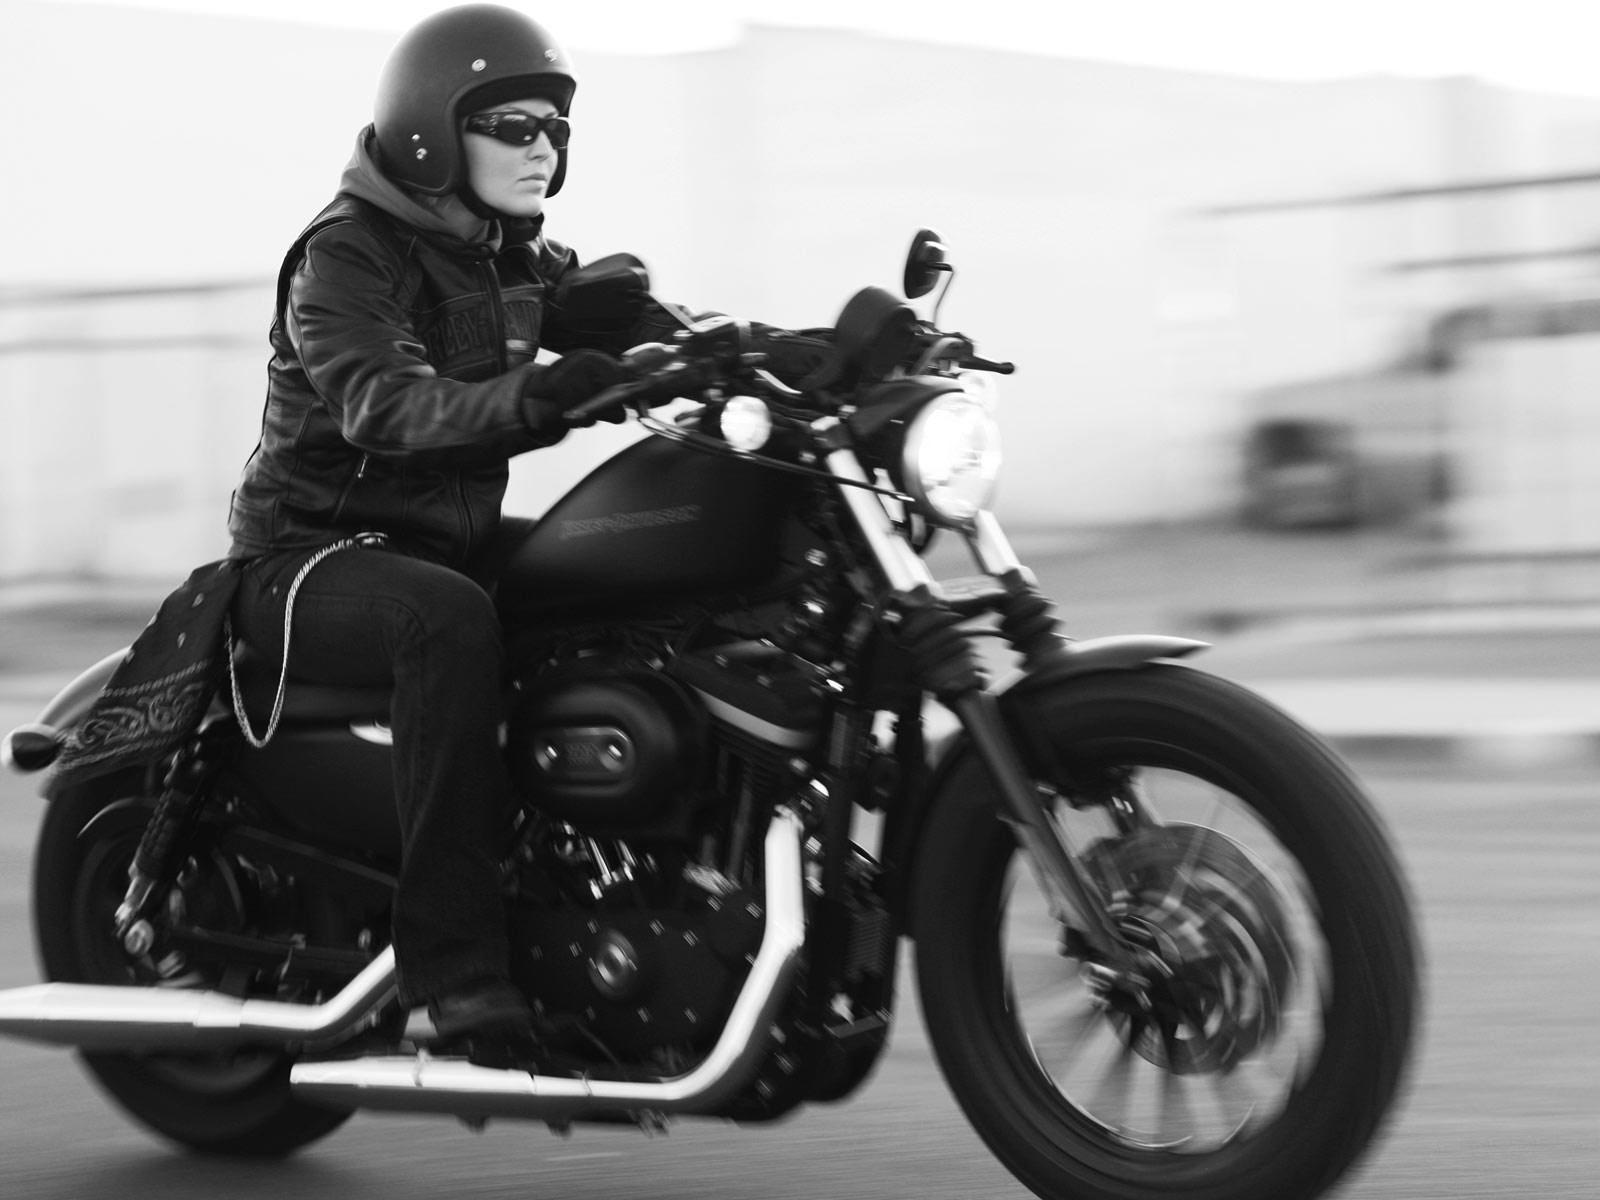 http://3.bp.blogspot.com/-Tsyqispay1w/Tp5OdpHa16I/AAAAAAAAGX0/4CLDU7RE6bg/s1600/Harley-Davidson-pictures_2010_Sportster-XL883N-Iron-883_1.jpg